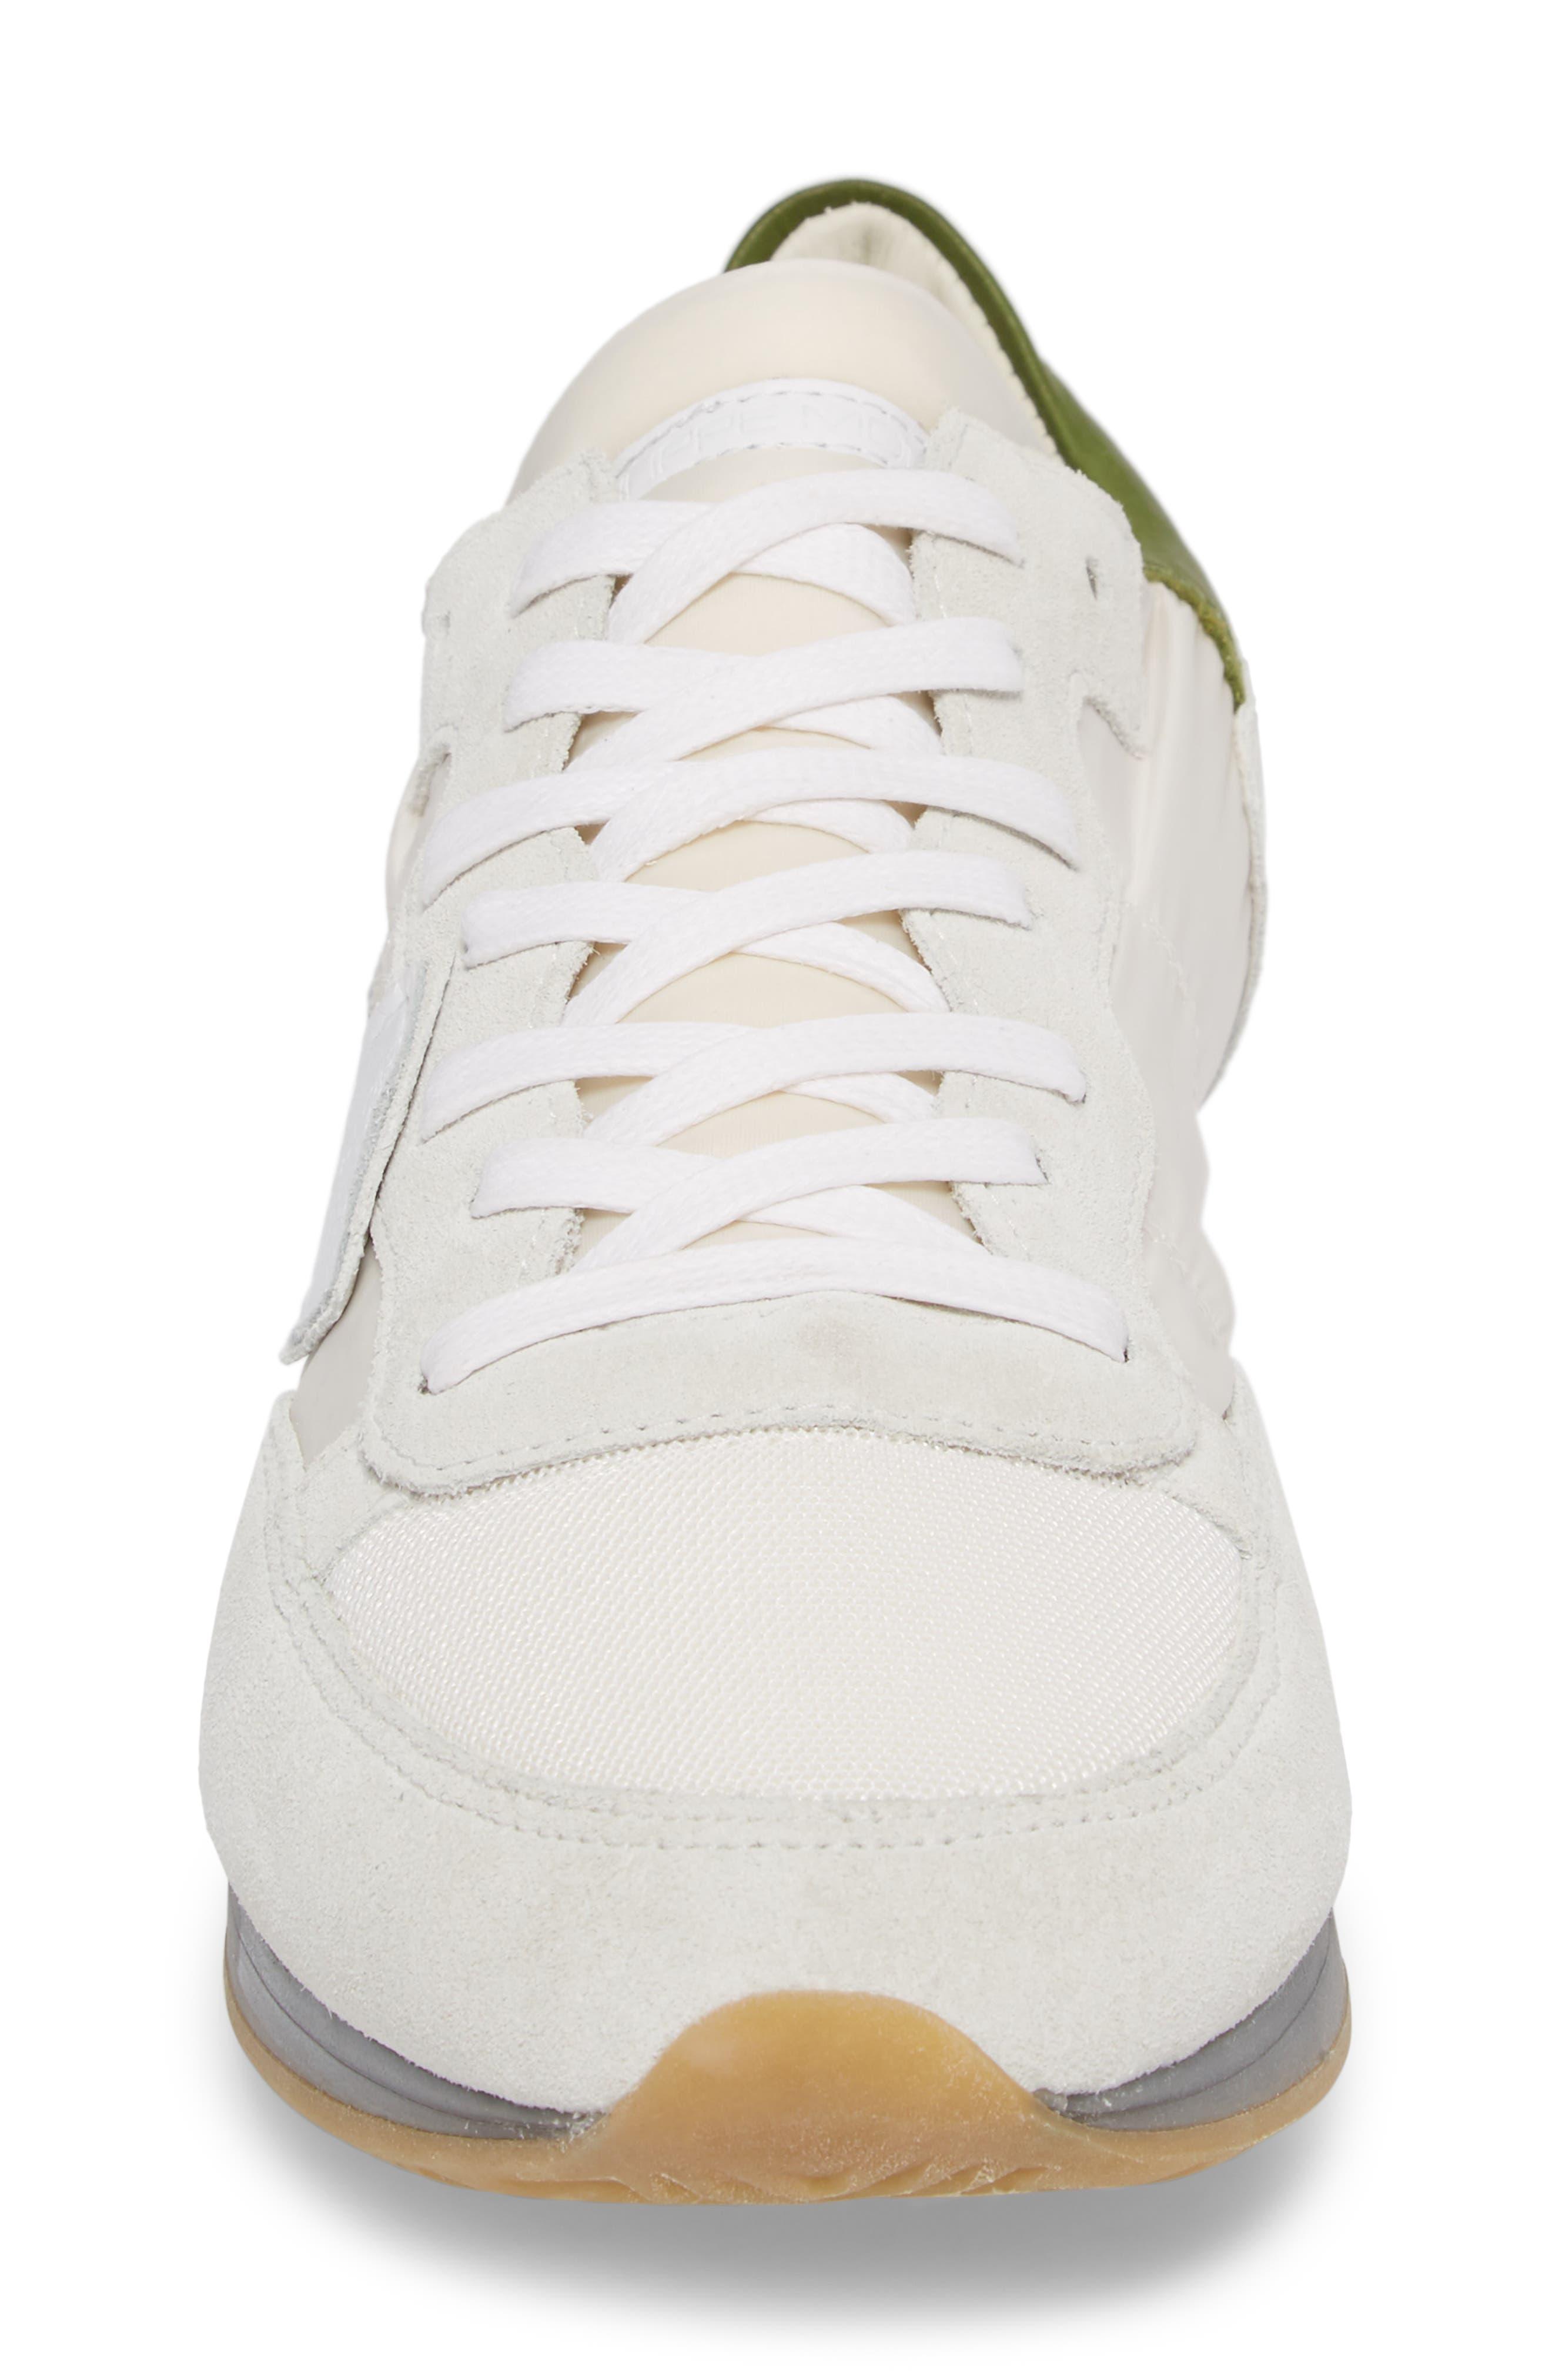 Tropez Sneaker,                             Alternate thumbnail 4, color,                             White/ Green